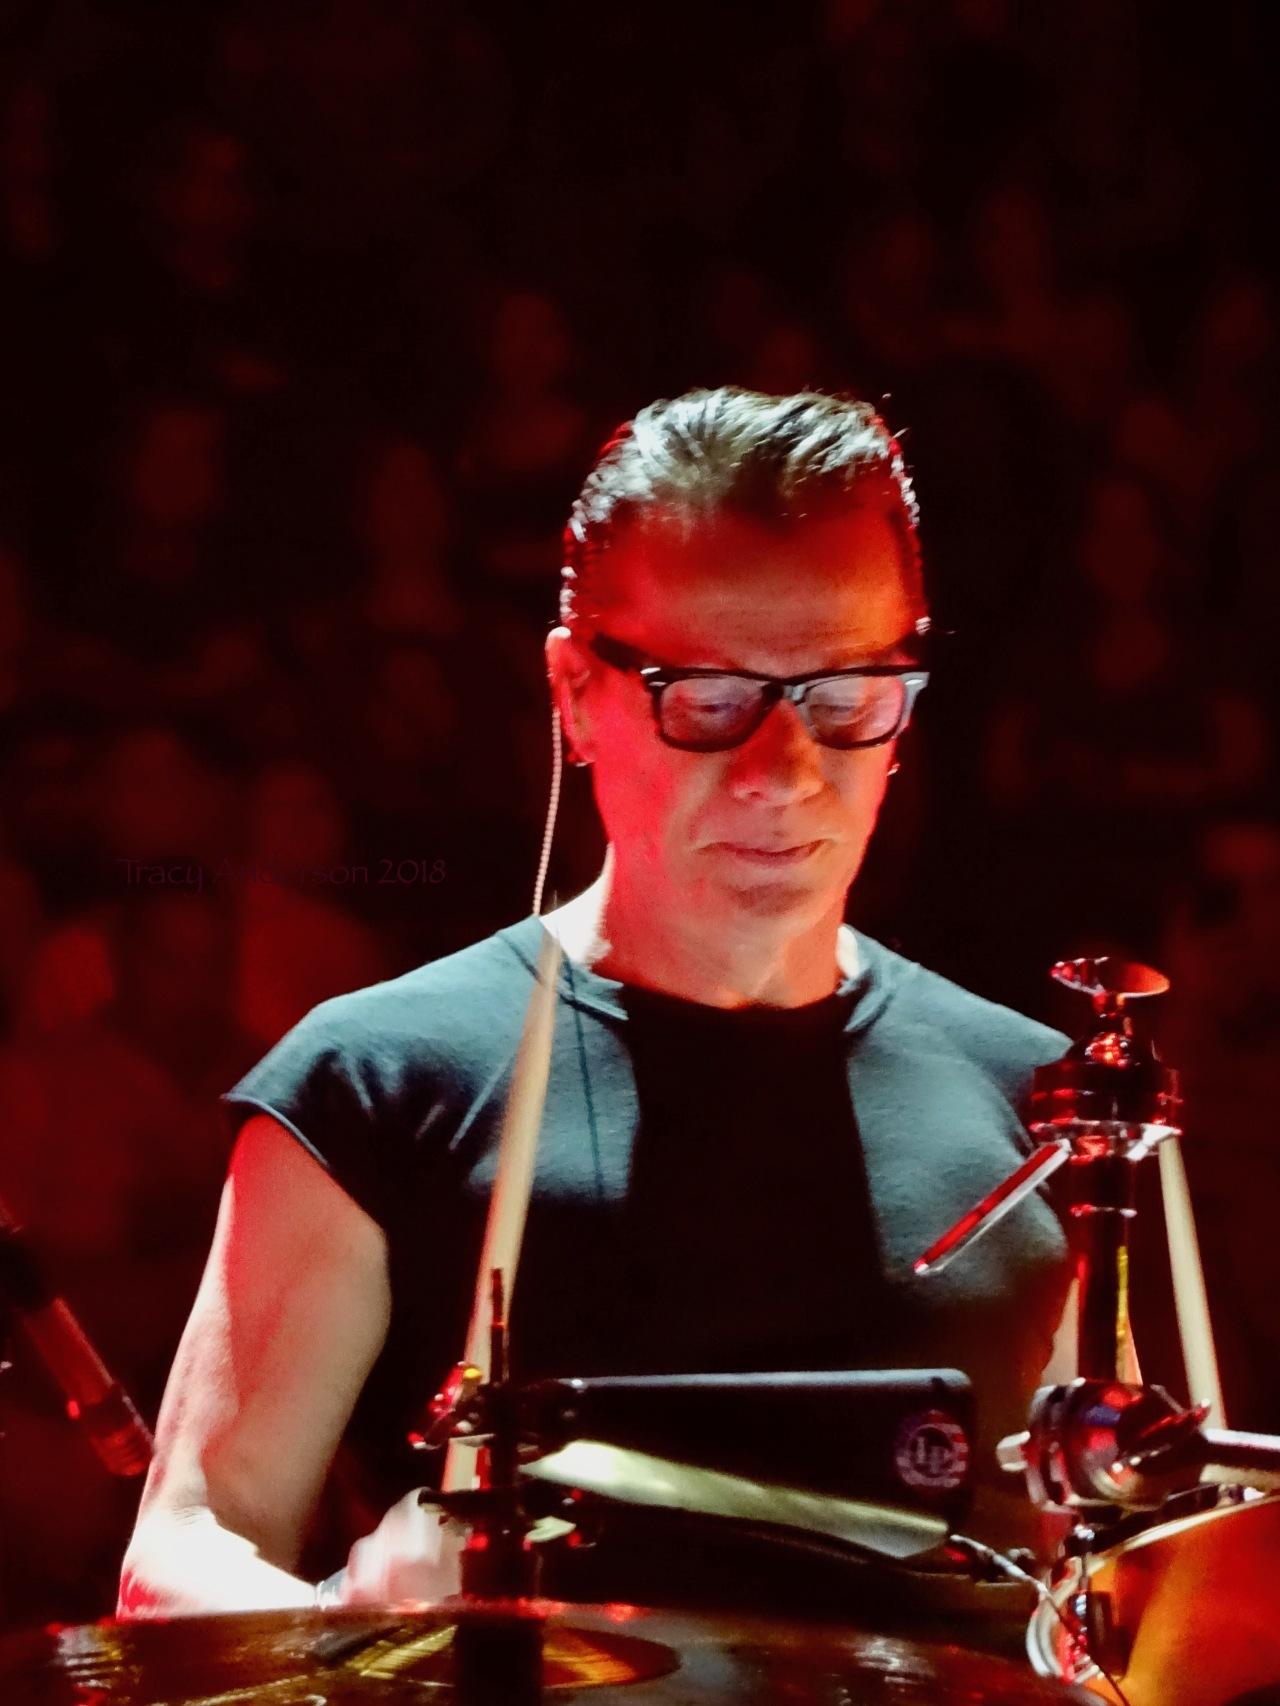 Larry Mullen U2 eiTour Las Vegas May 11 2018